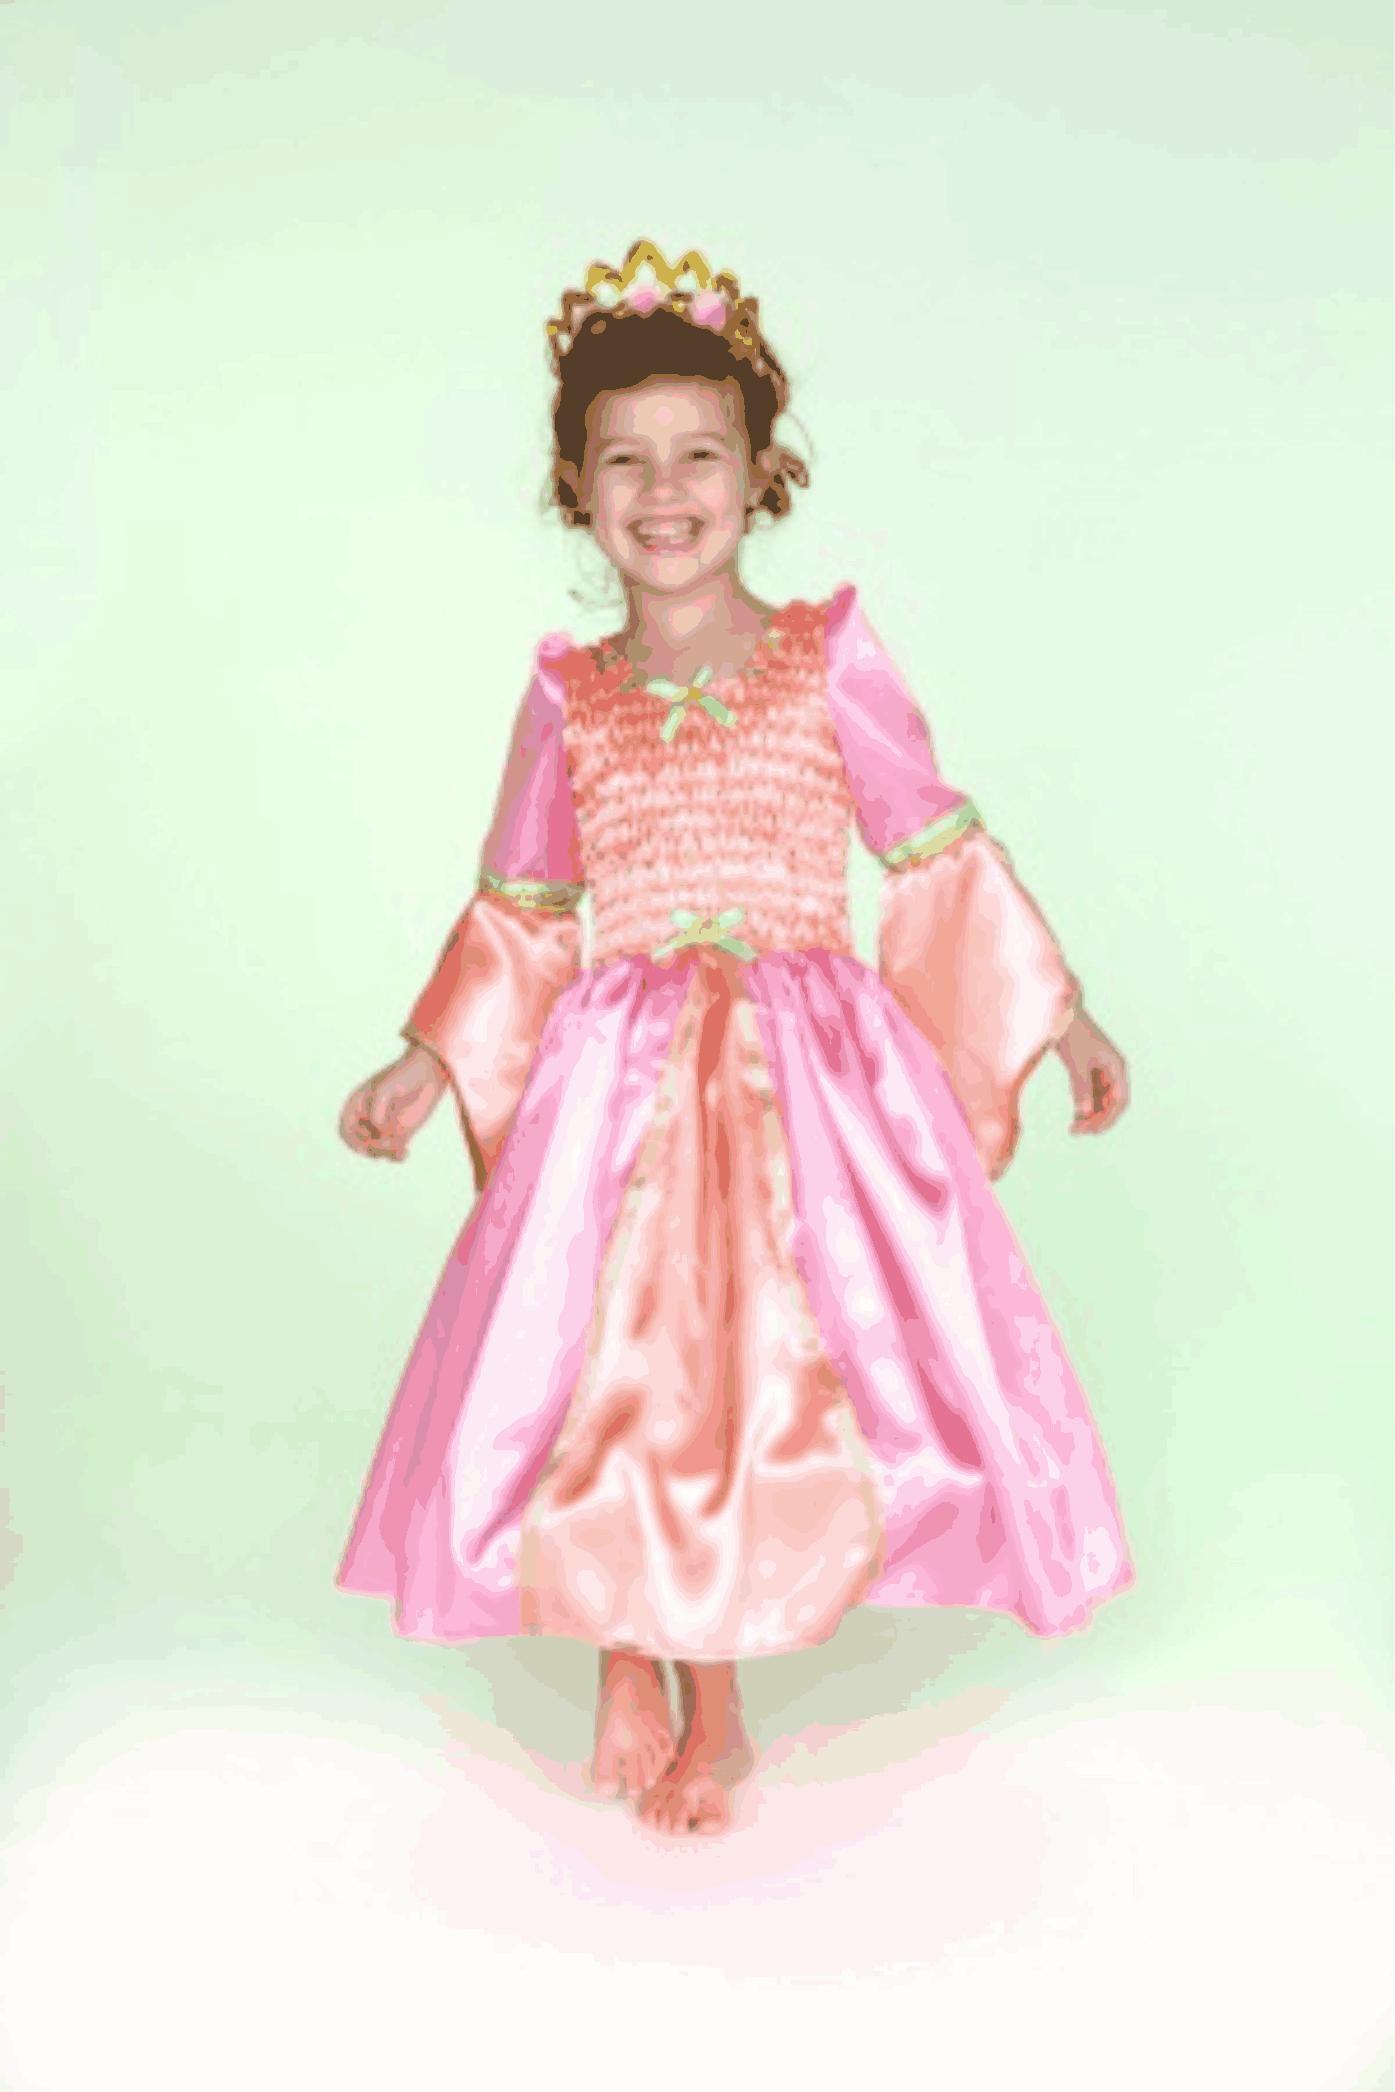 8-10 - ROSE & ROMEO - Kostüme - Mädchen - Kleider - Lilou ...